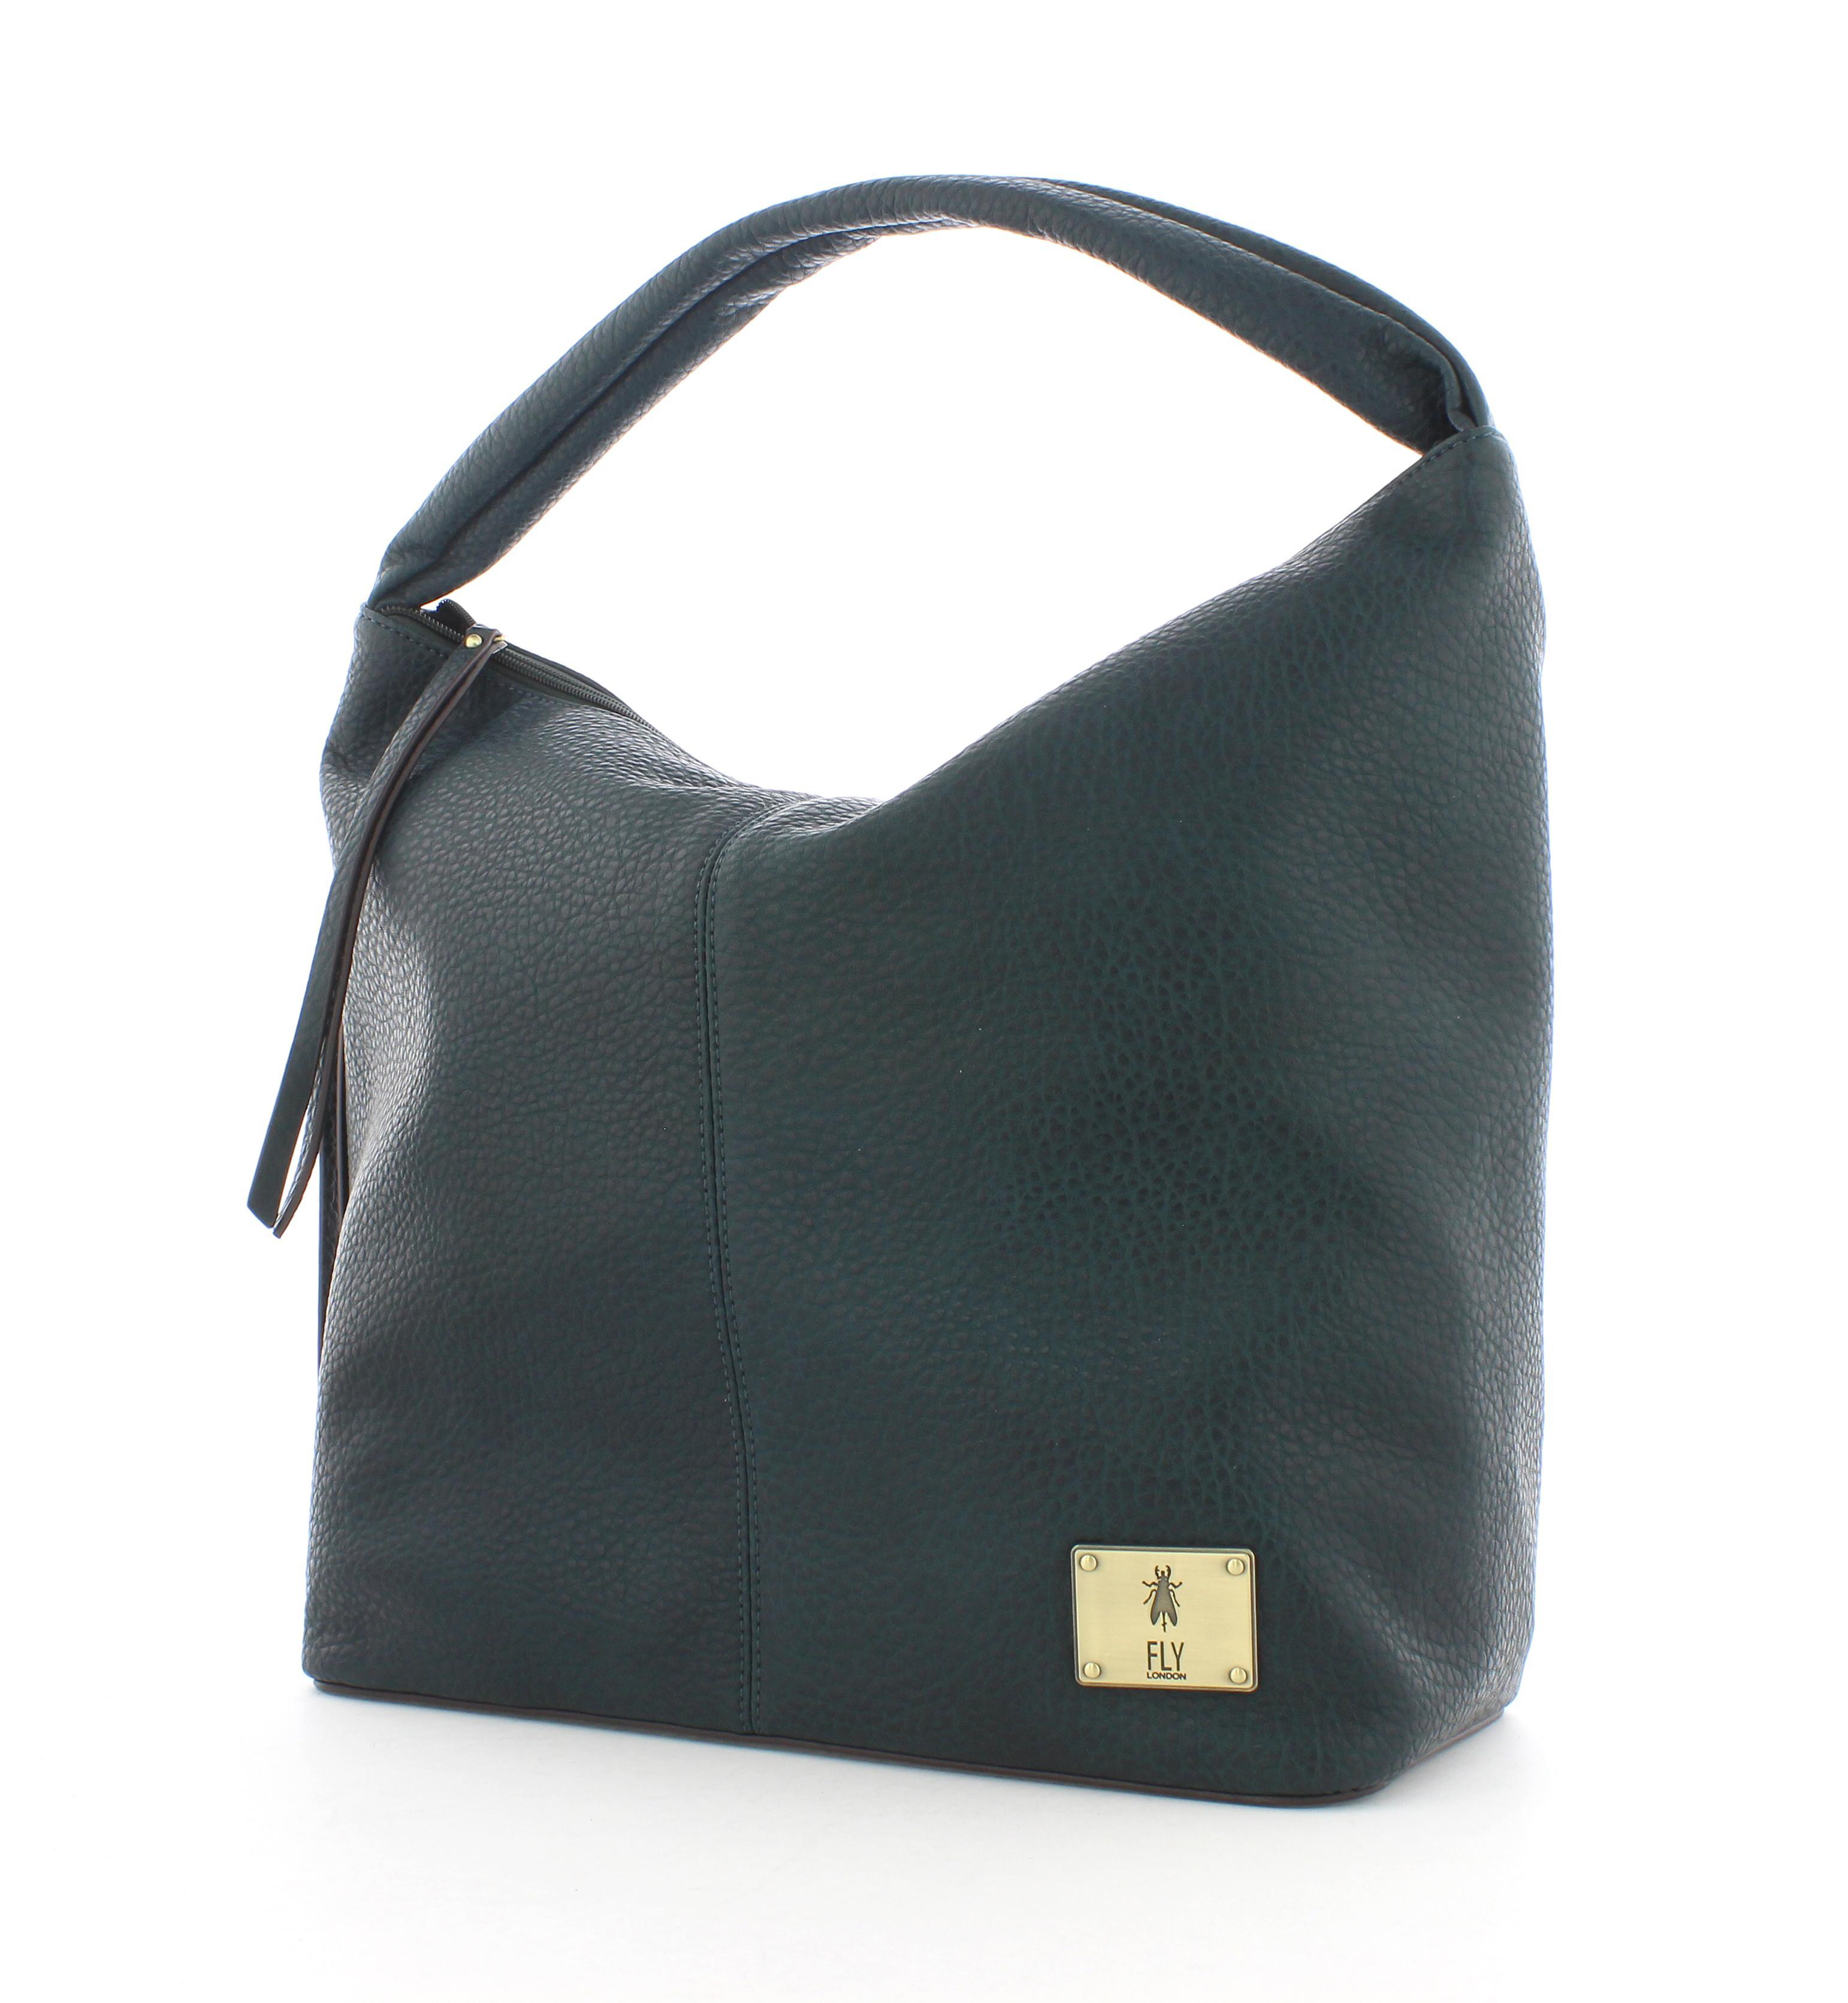 95a06eafe5a84 Bag FLY LONDON Bags Zana639 Dark Green